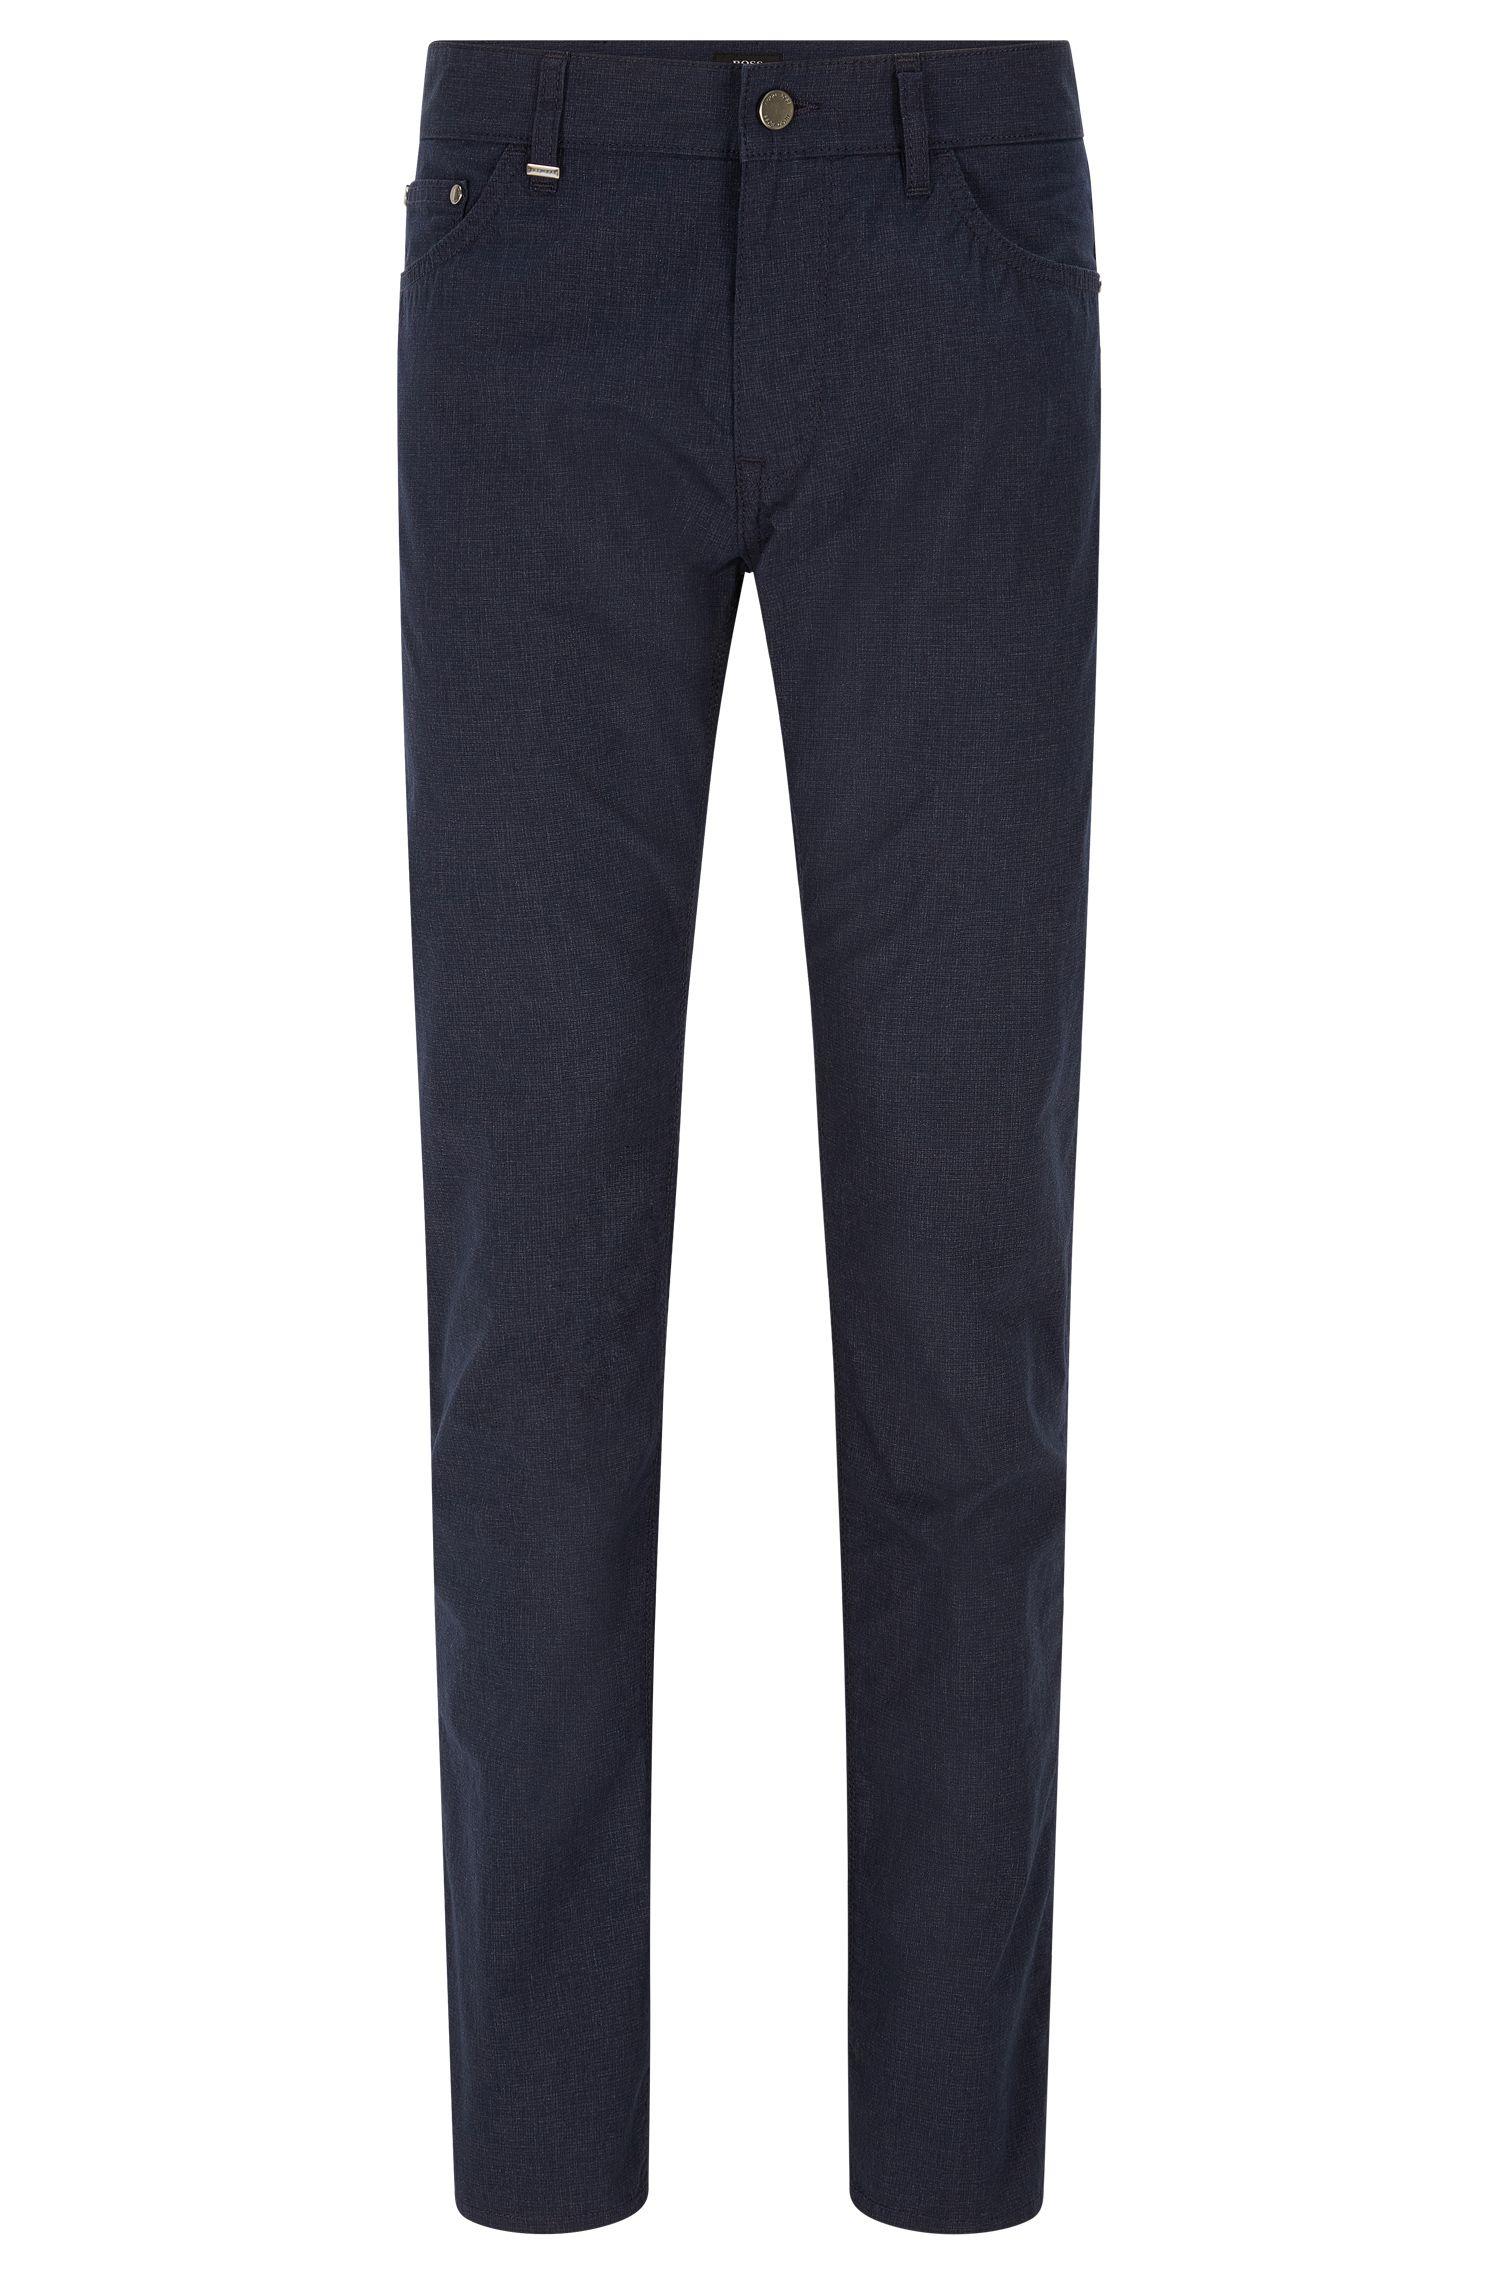 9 oz Basketweave Italian Stretch Cotton Pants, Regular Fit | Maine